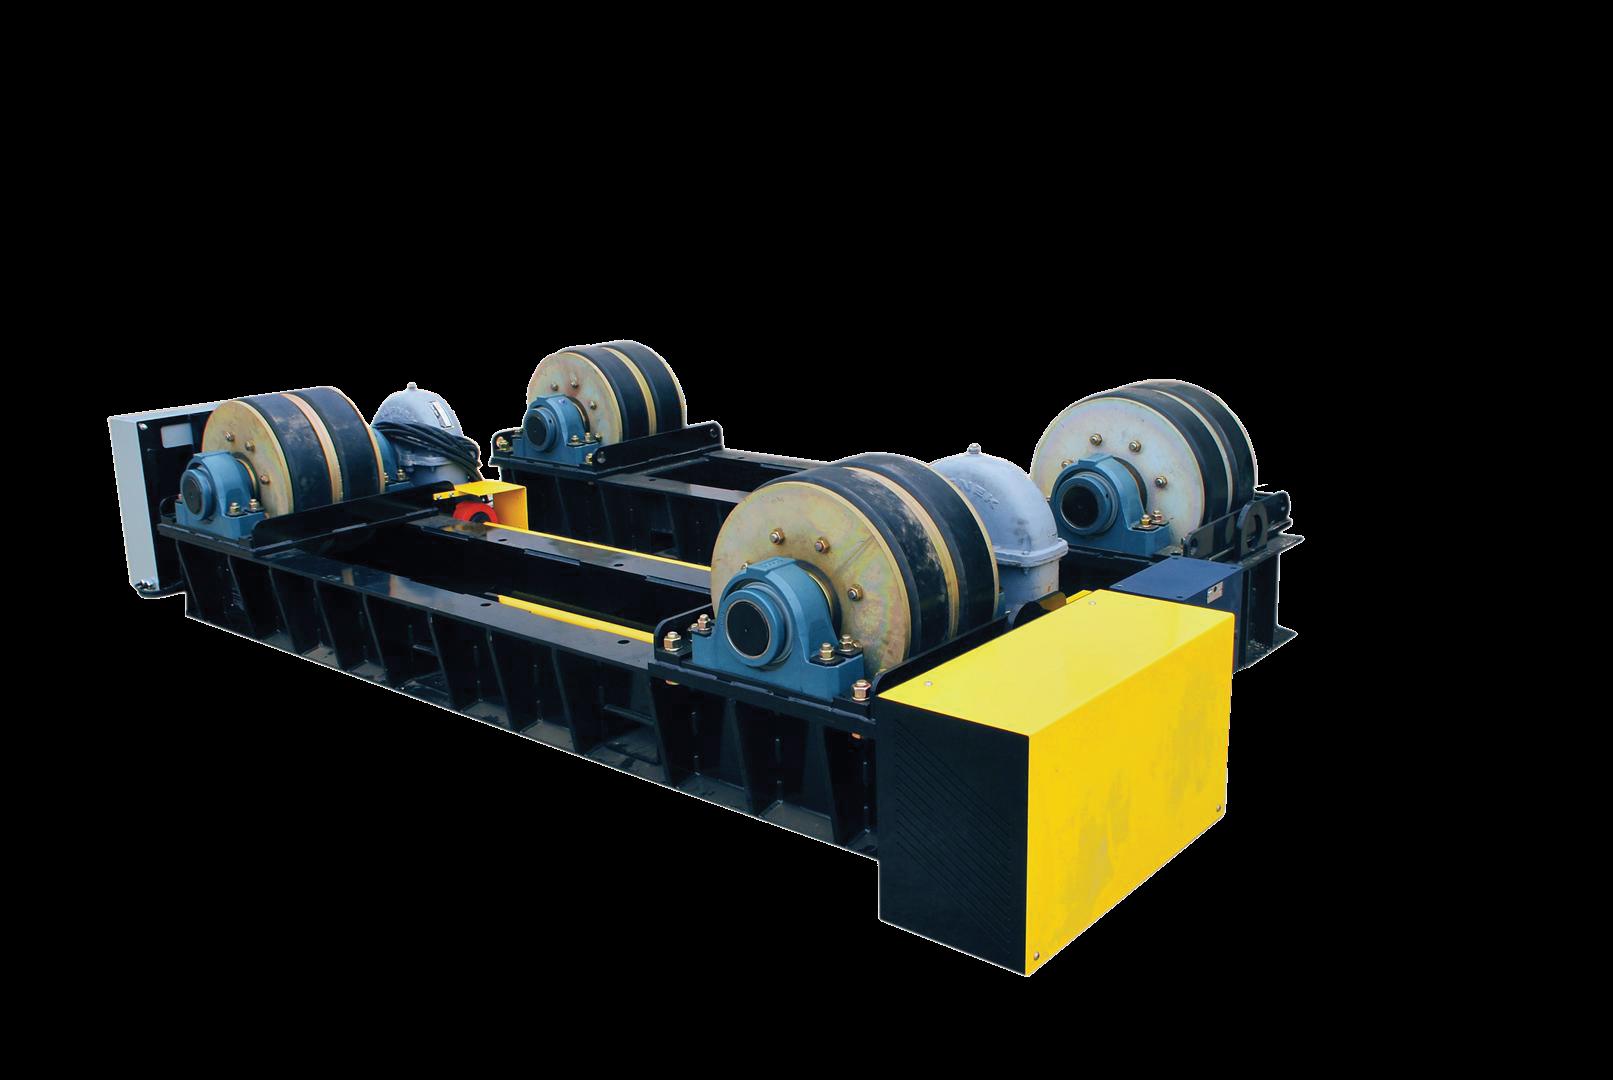 120 ton tank rollers (tank turning rolls)